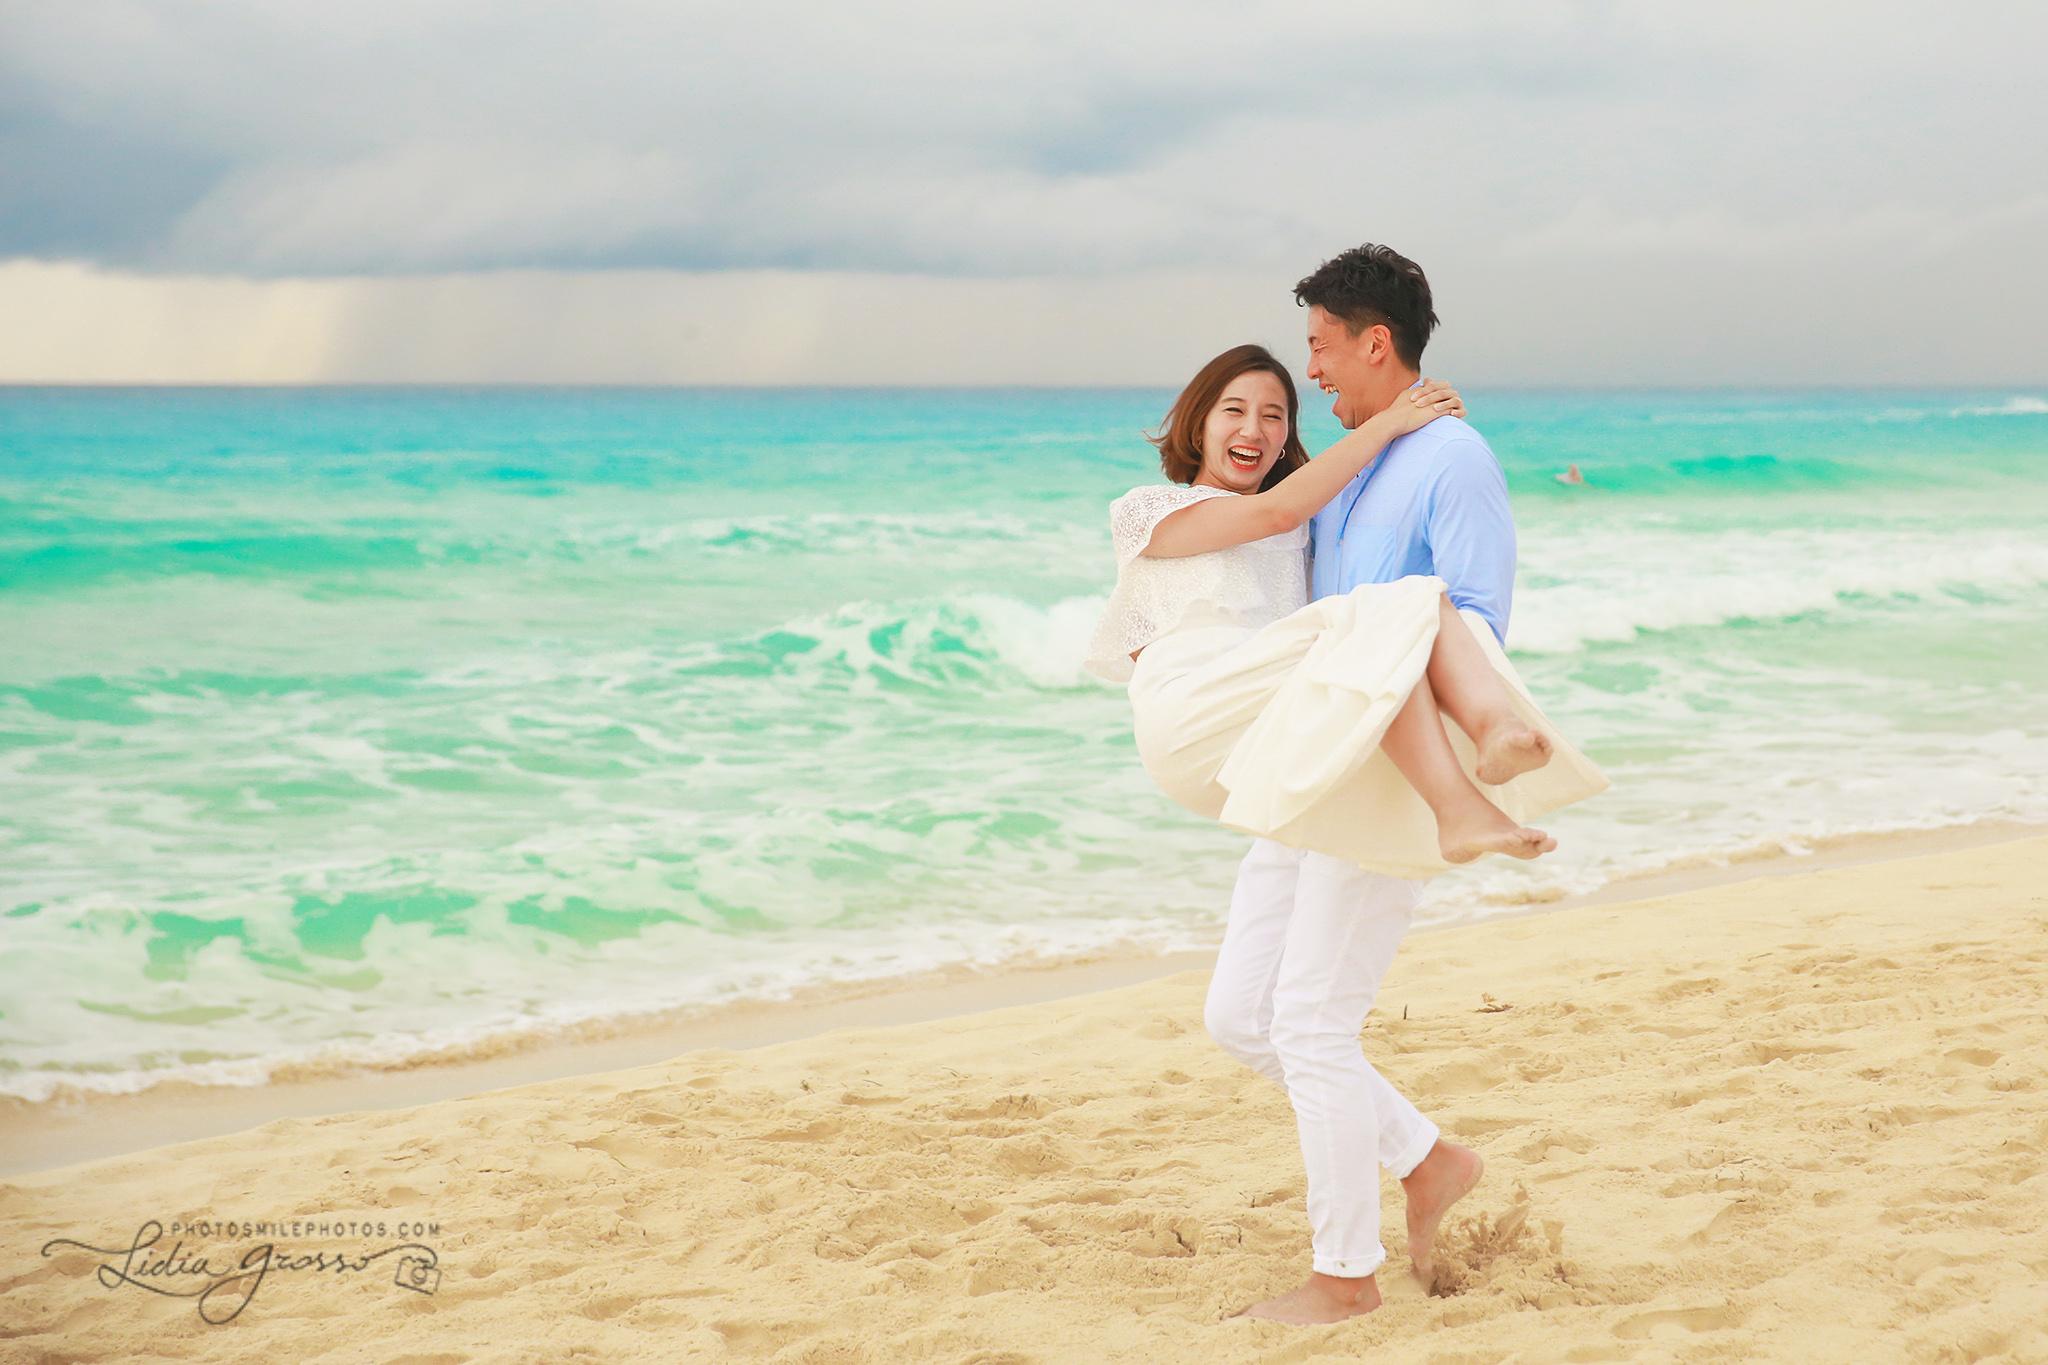 Playa Delfines Cancun couples portraits, Beach photography Cancun, Japanese couples Potraits Cancun, honeymoon photos Cancun, Cancun Photographer, His agencia de viajes cancun photographer